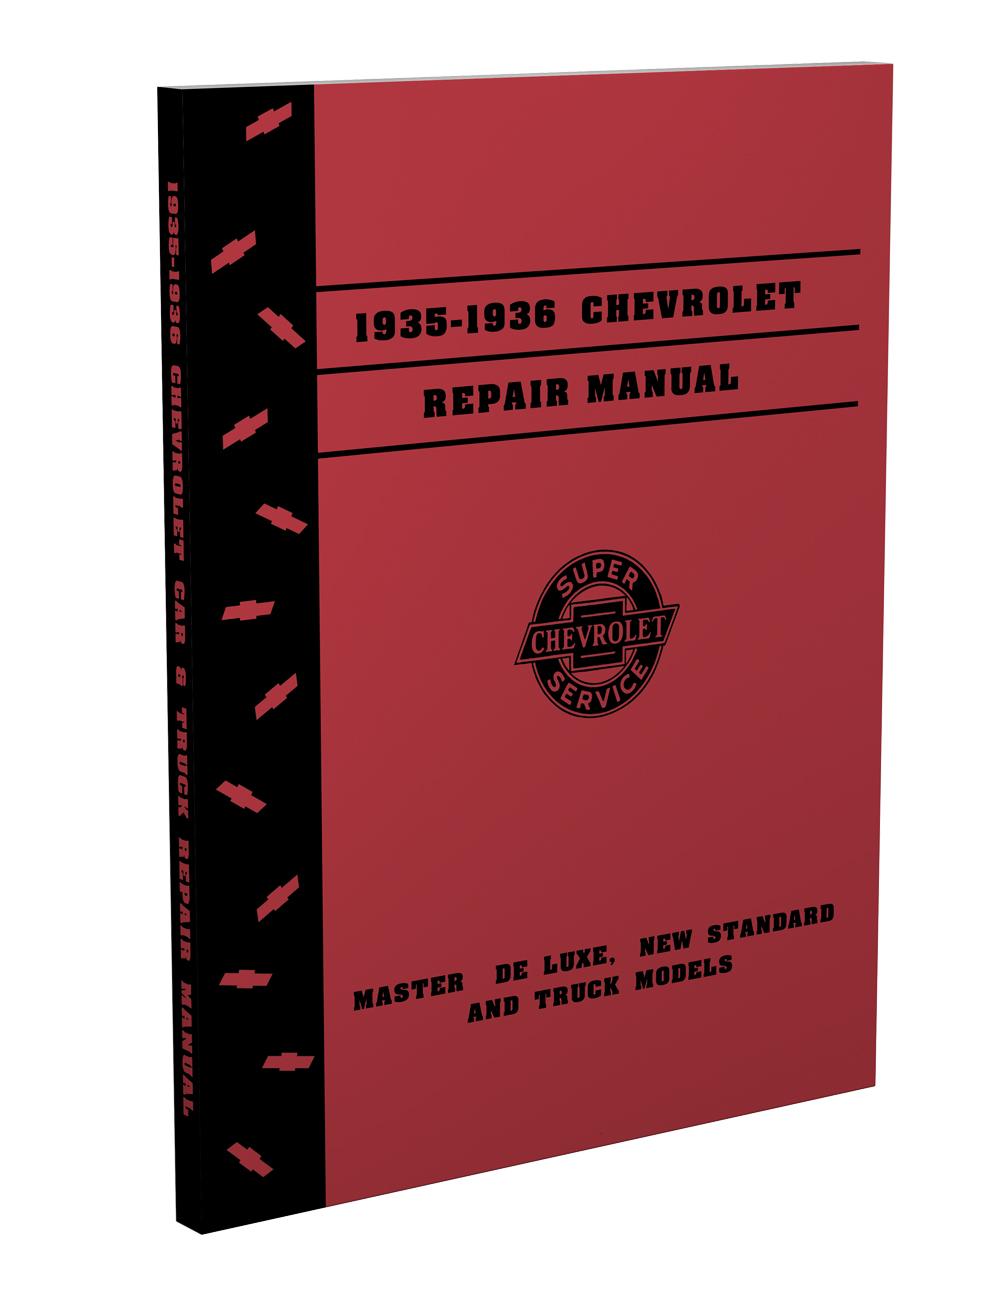 medium resolution of 1935 1936 chevrolet shop manual reprint all models